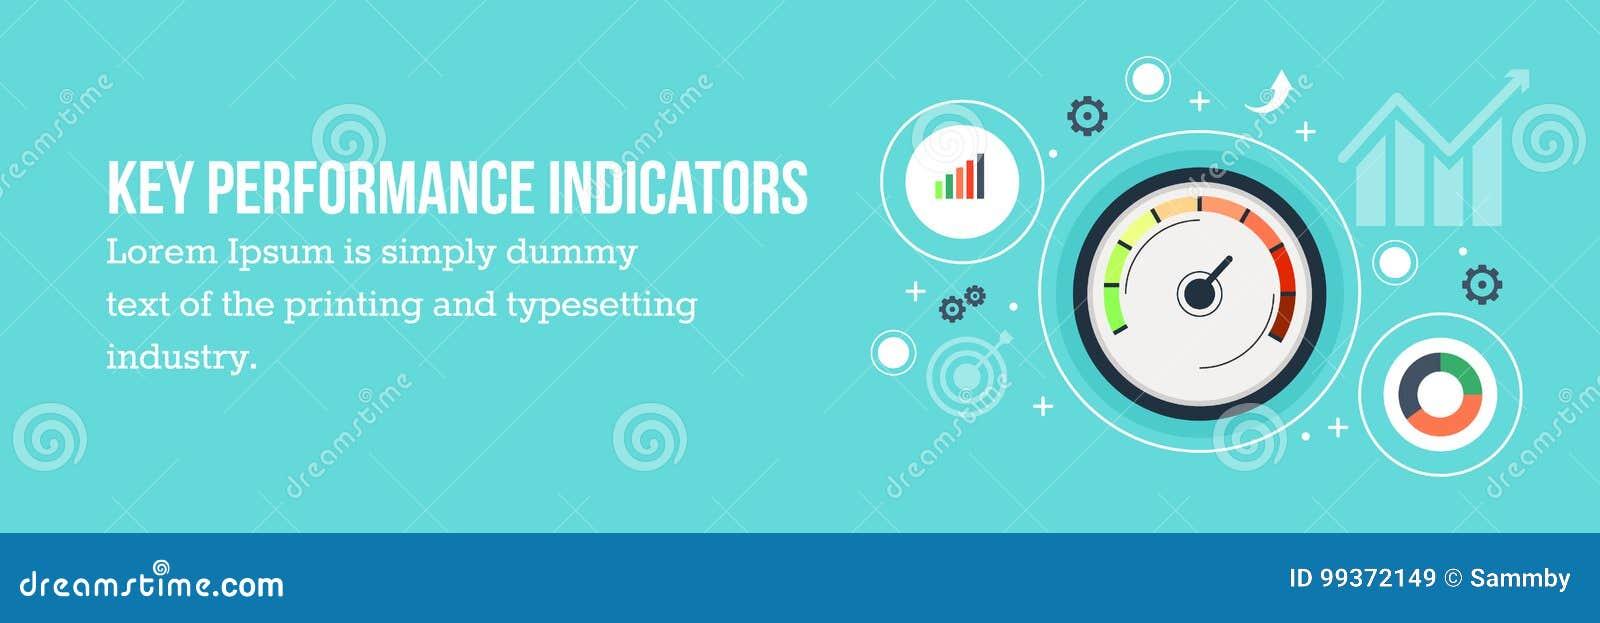 18 Key Performance Indicator (KPI) Examples Defined